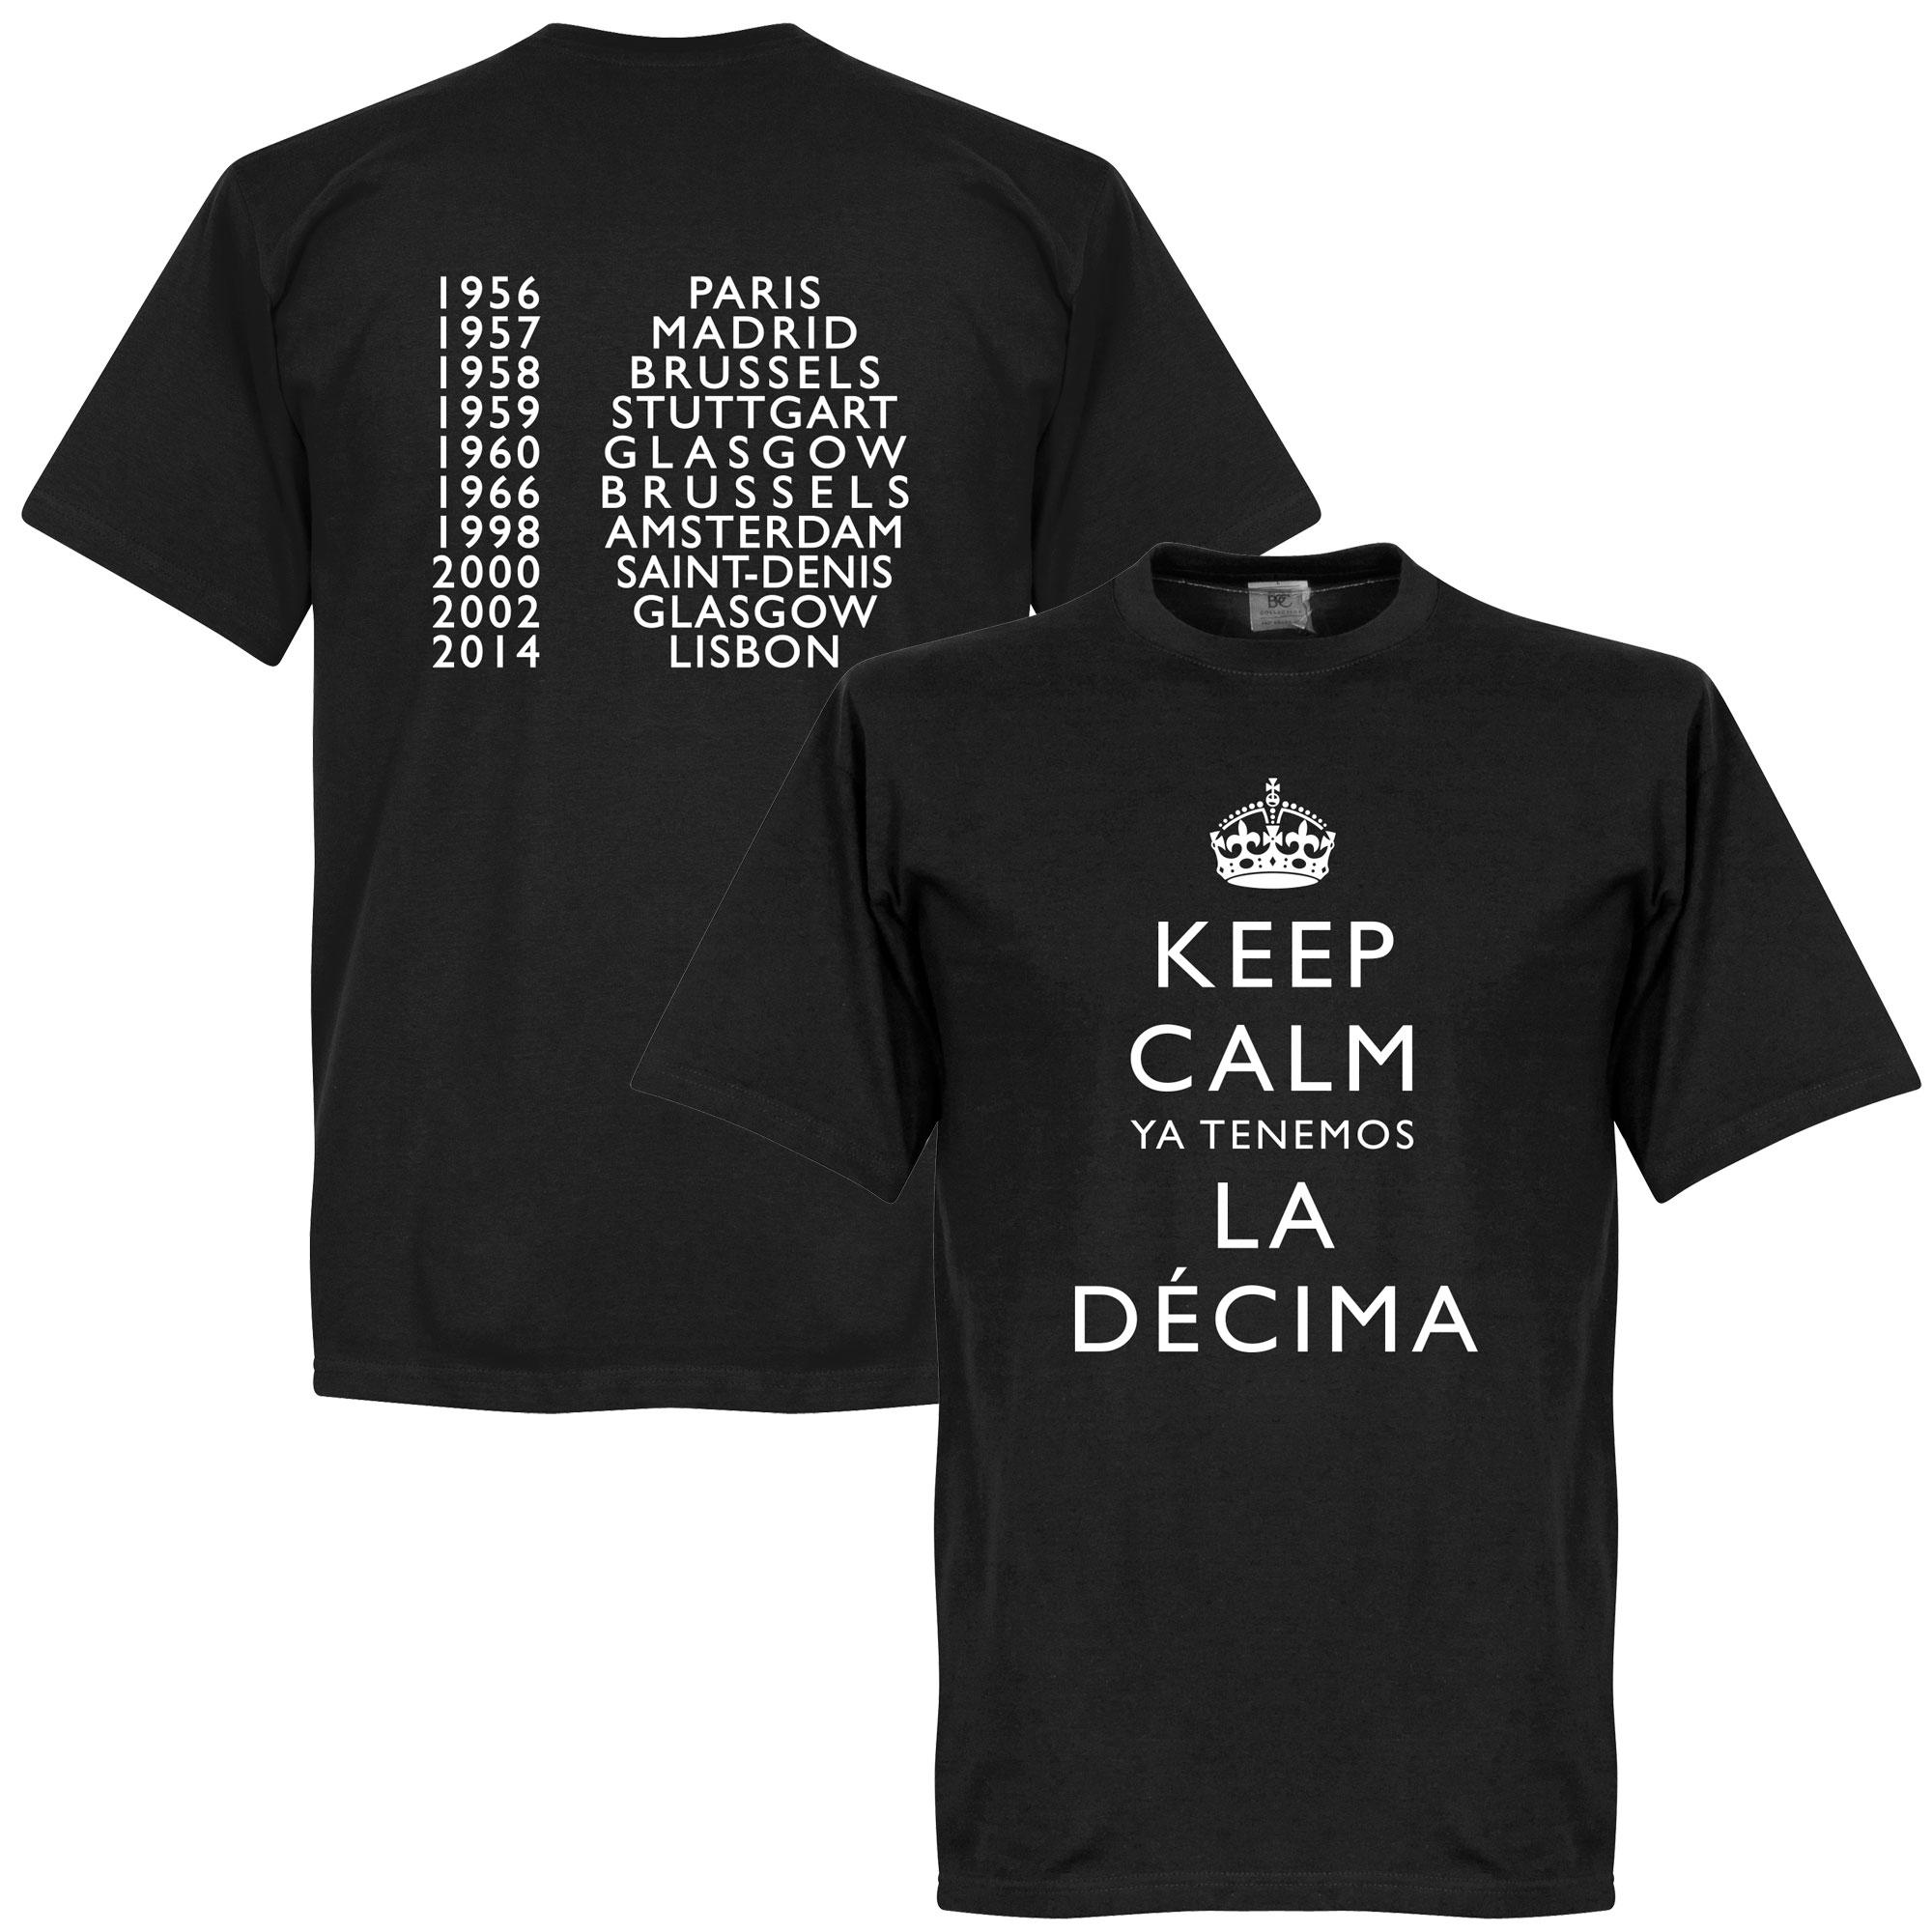 Keep Calm Ya Tenemos La Decima Tee - Black - M